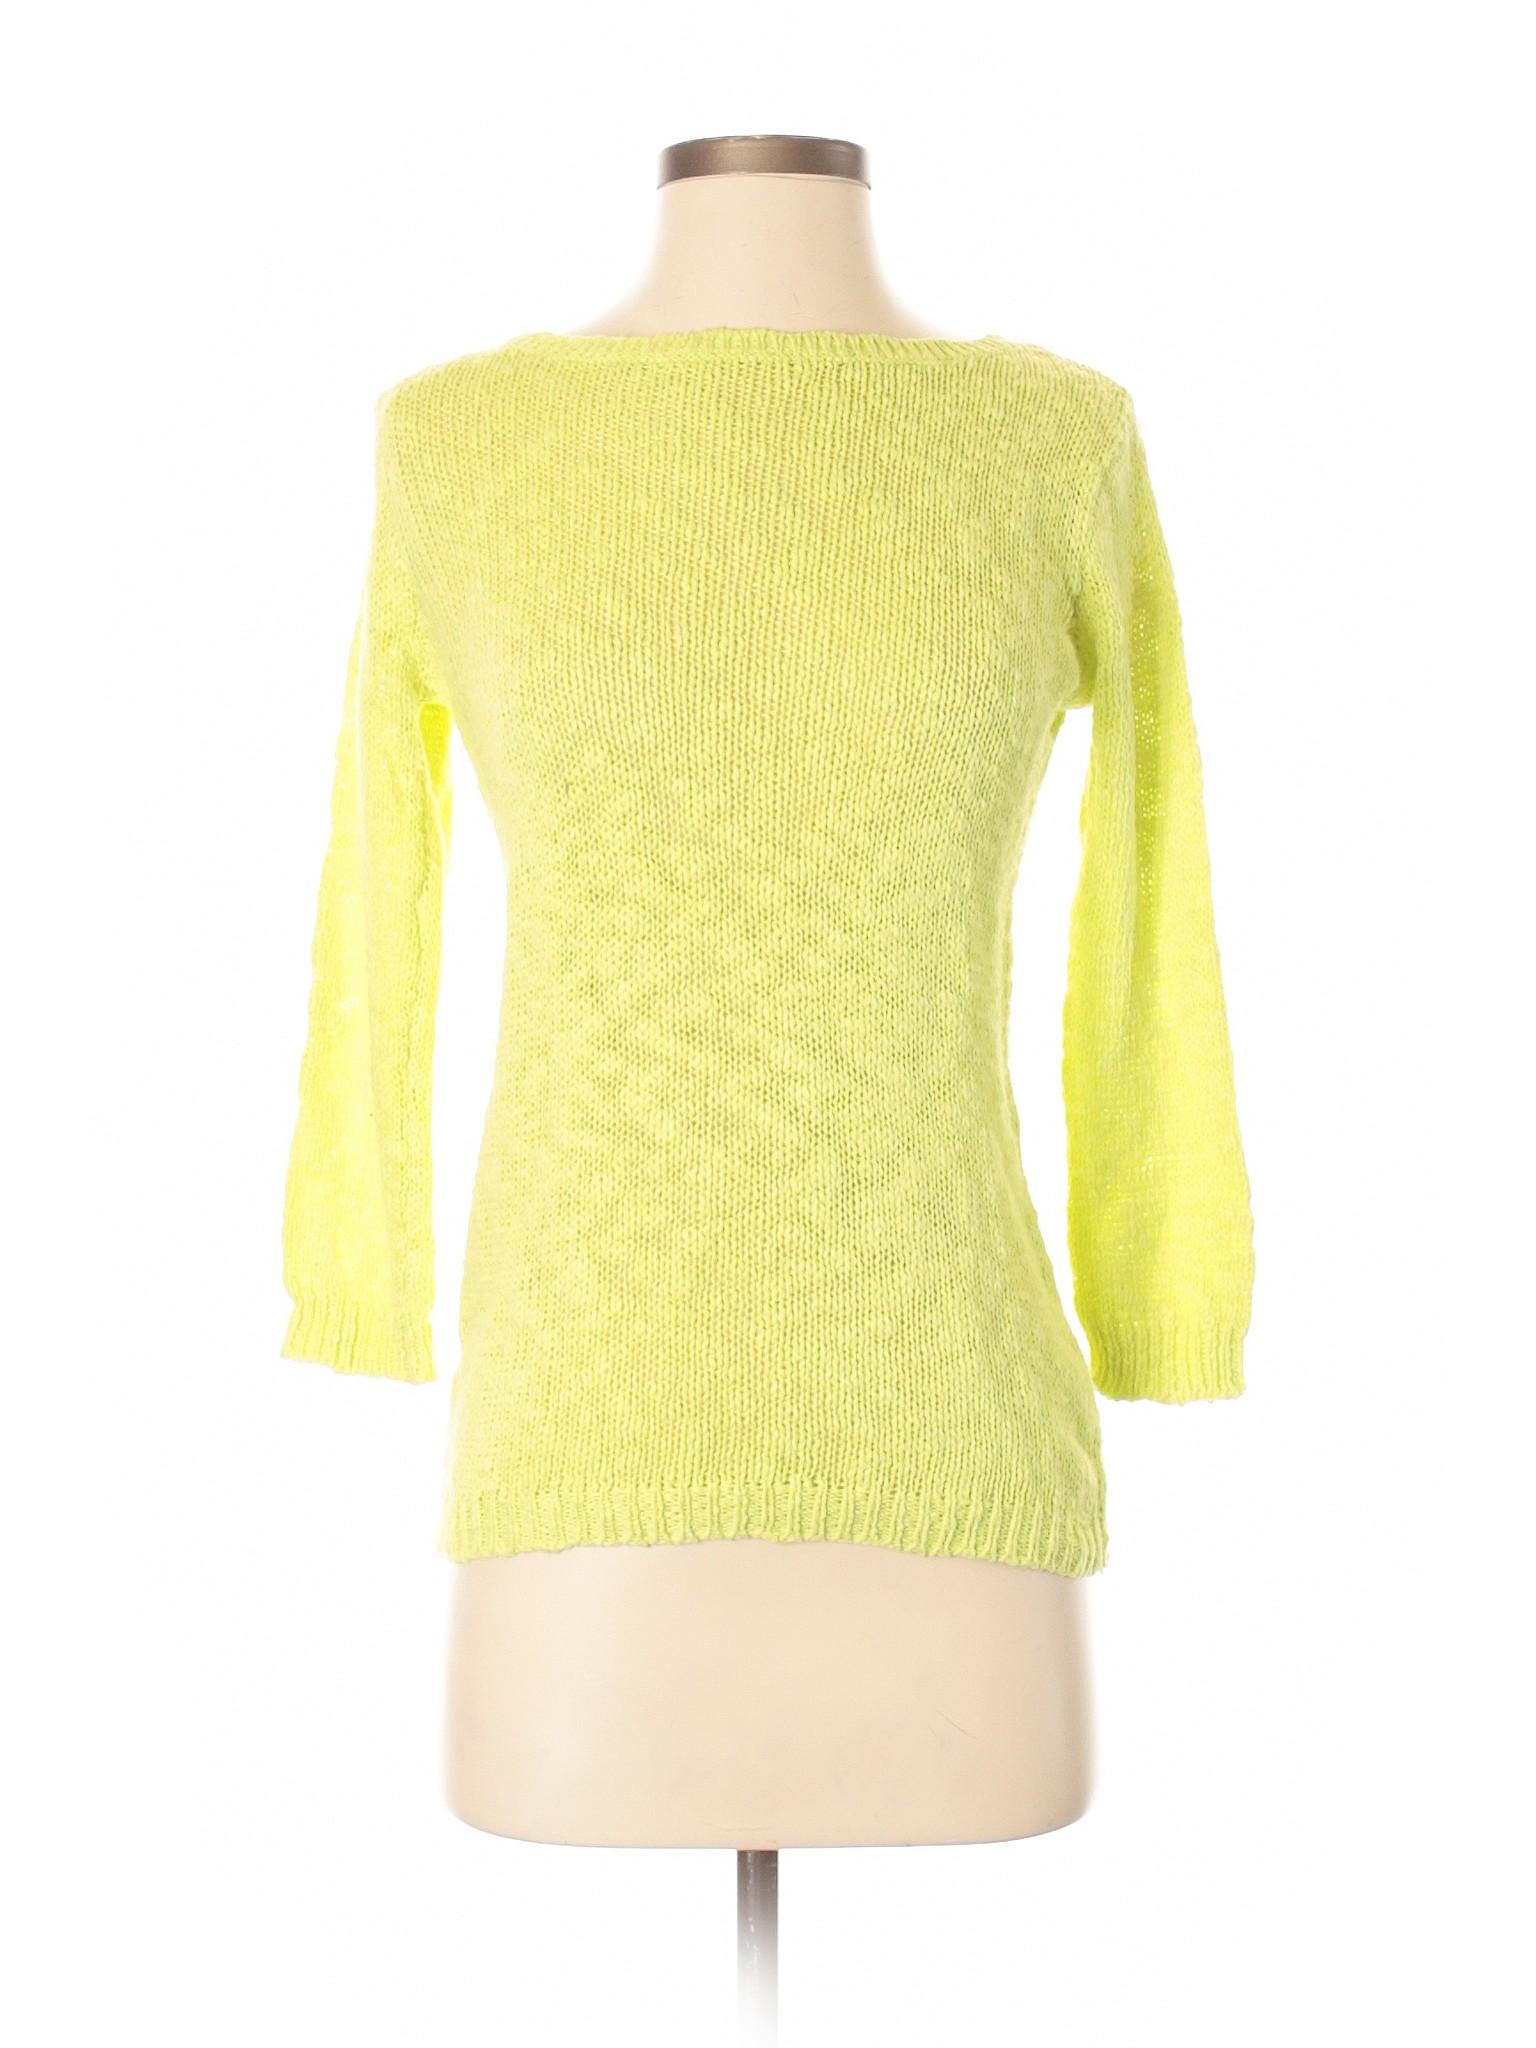 Boutique Sweater Boutique Joe Joe Fresh Pullover RxwZHWxq50